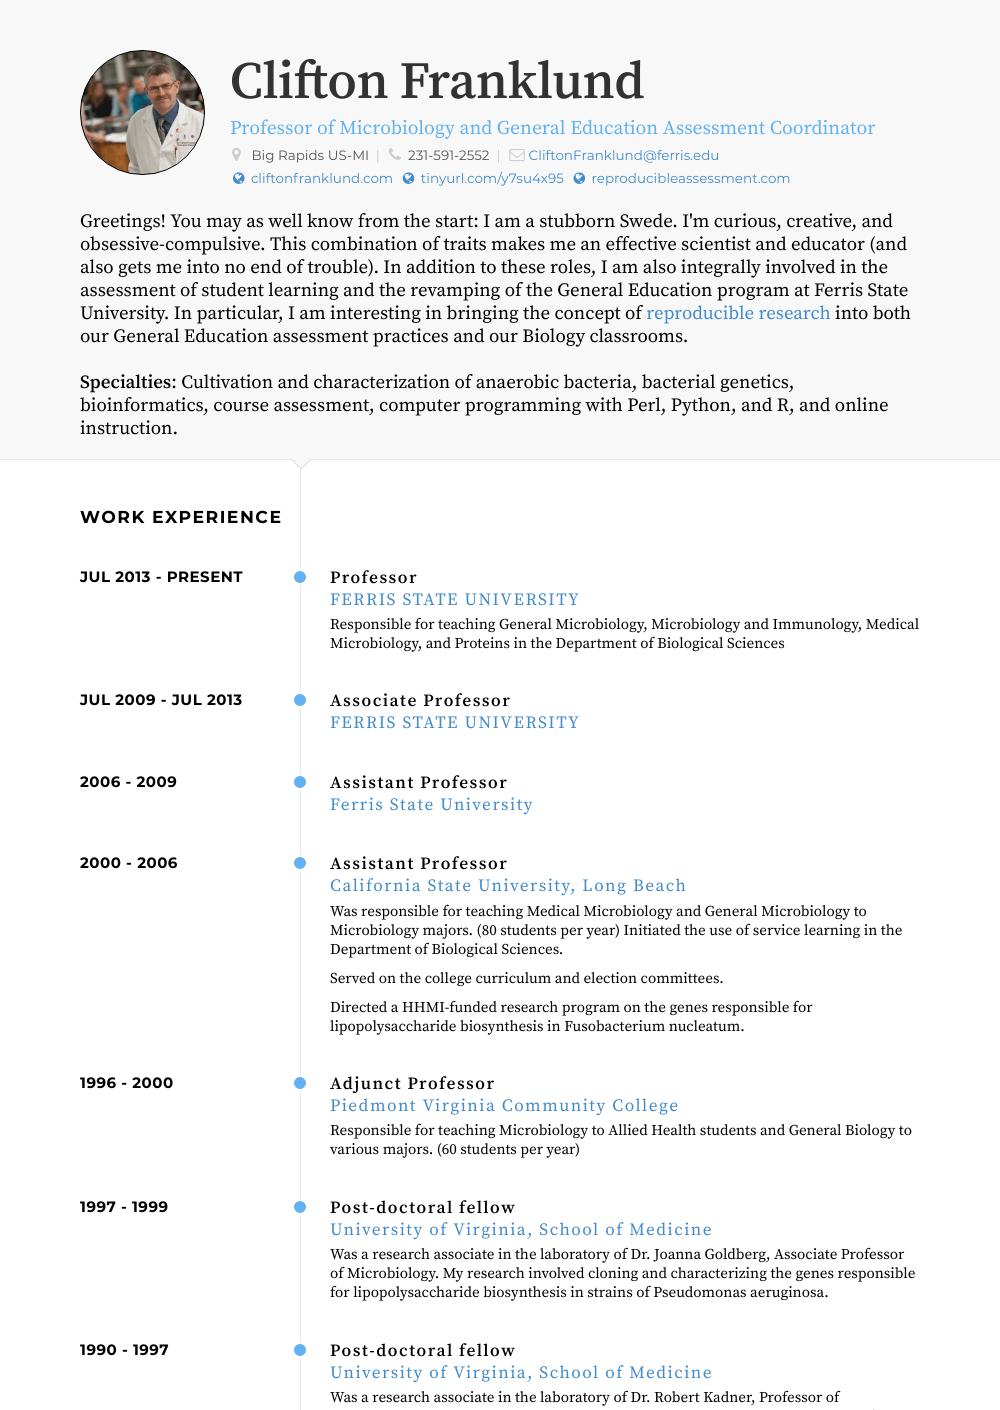 Professor  Resume Samples  Templates  VisualCV